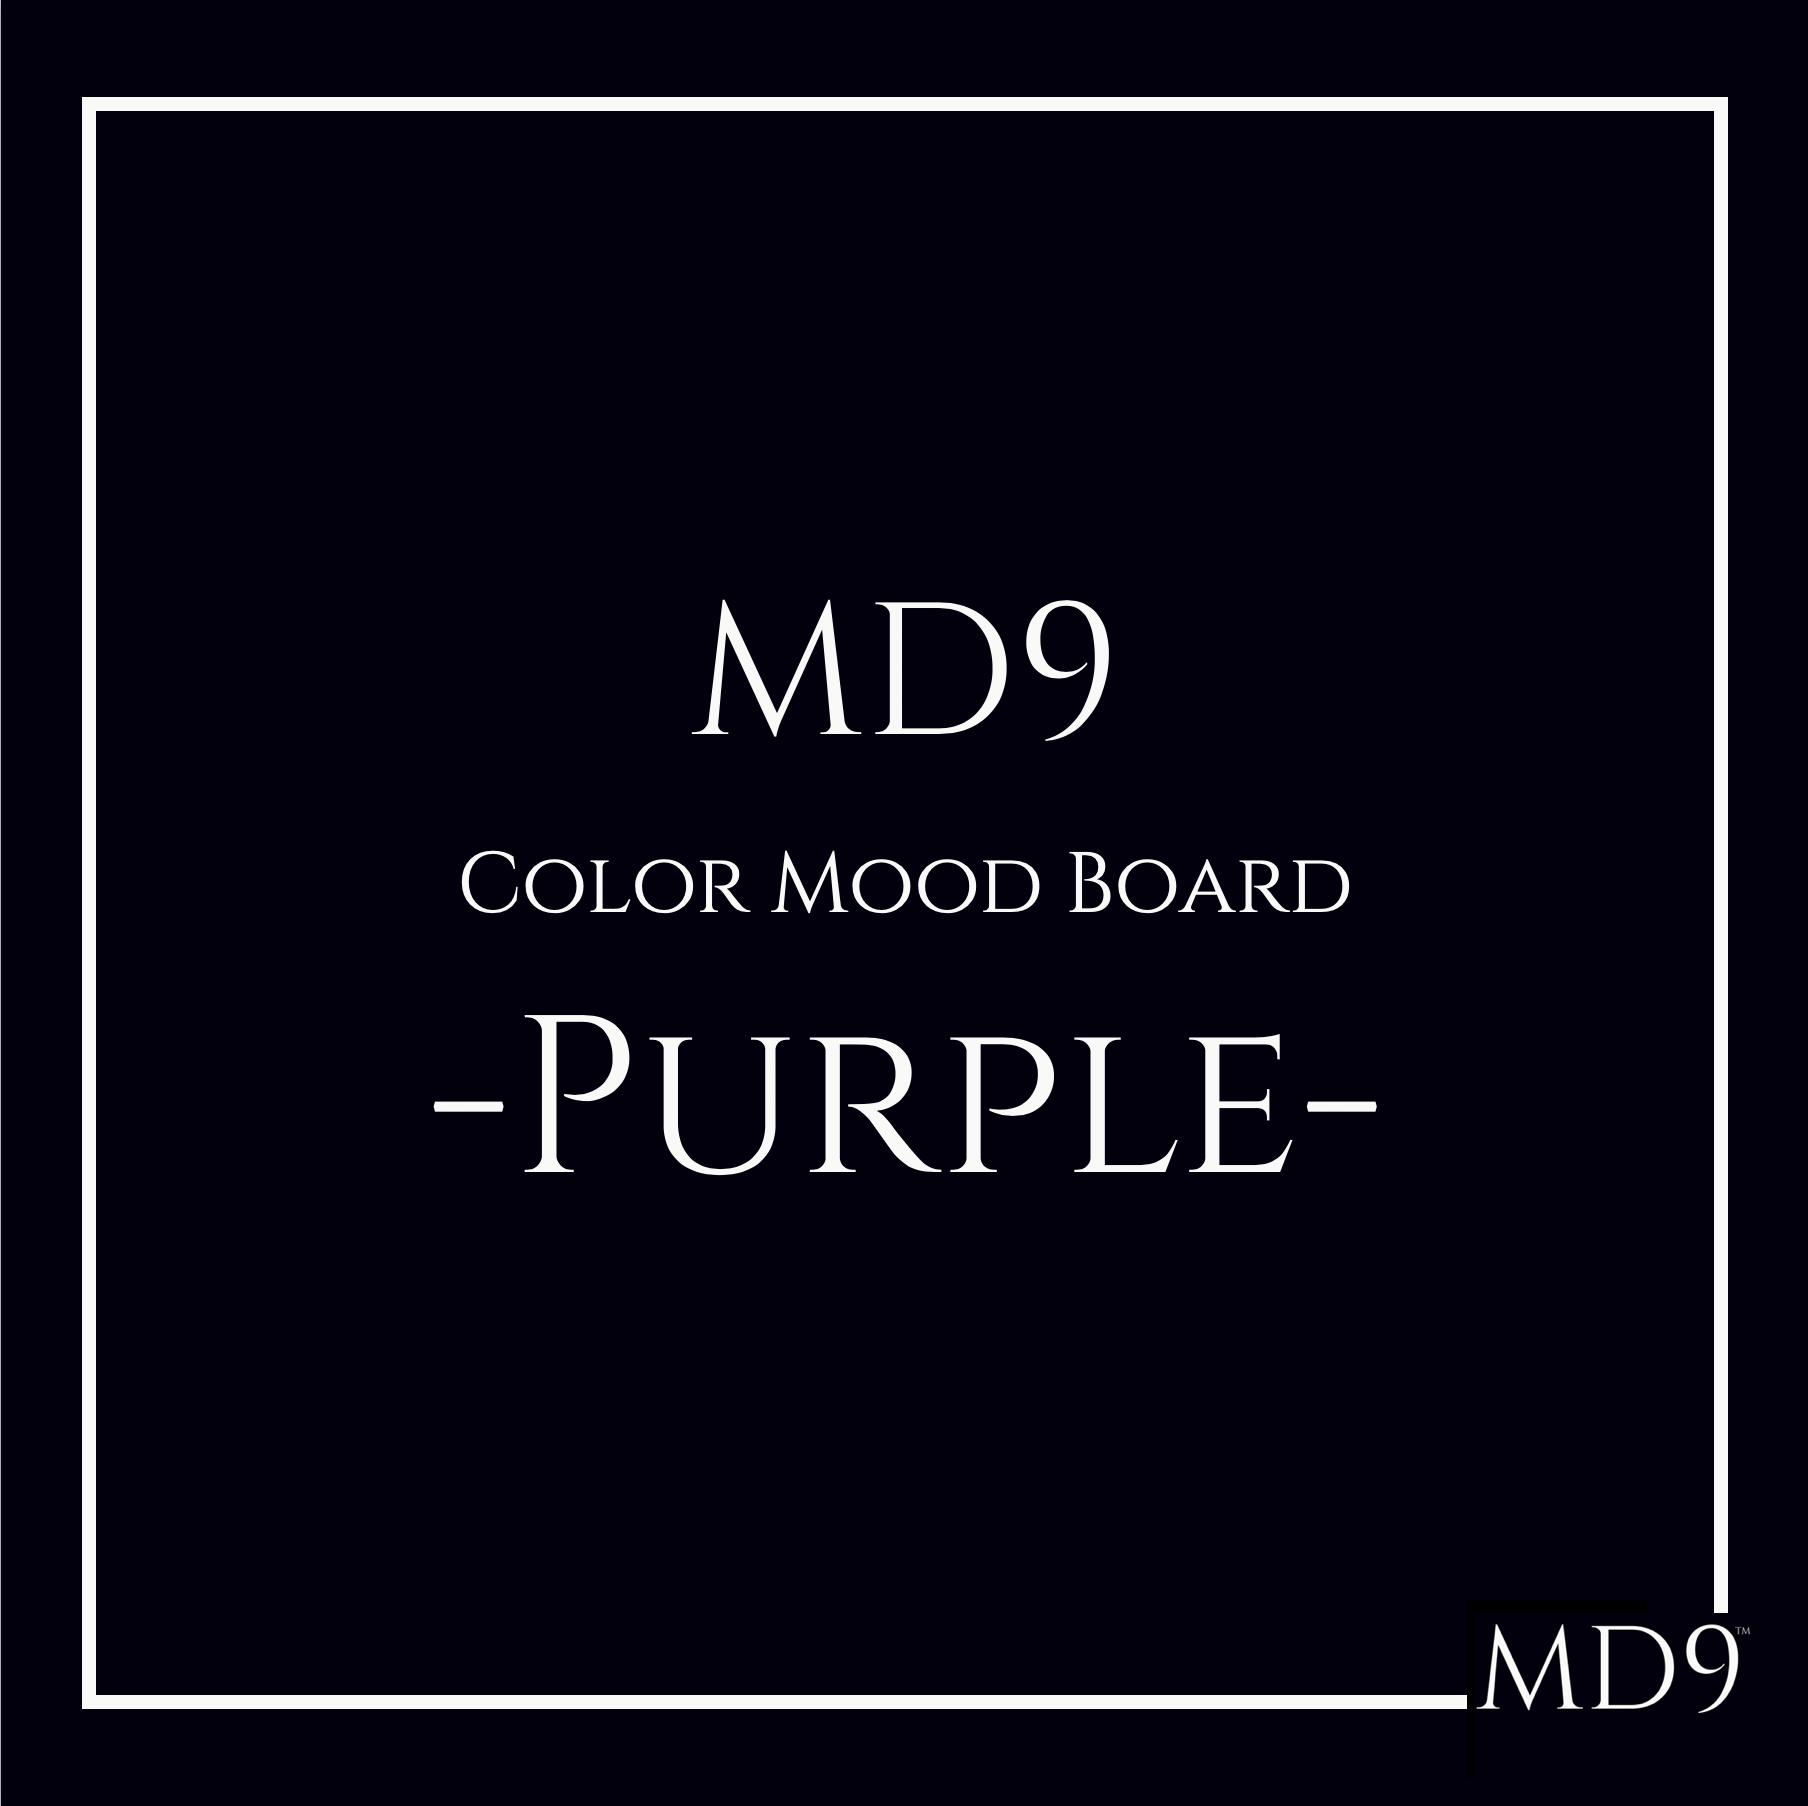 MD9's Colors Mood Board – Purple